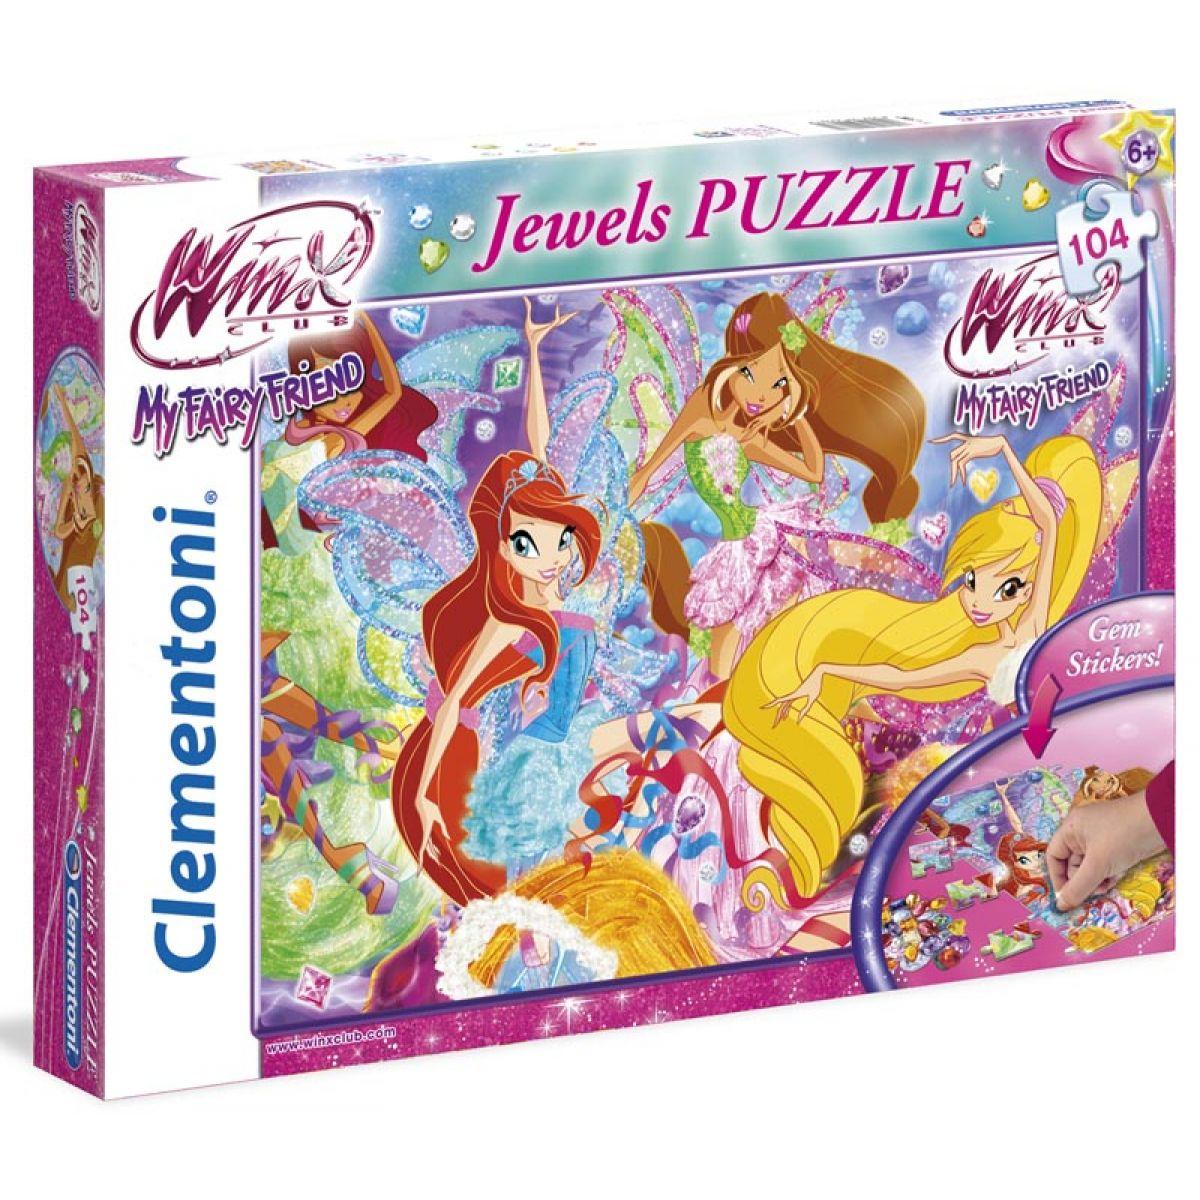 Clementoni Puzzle Winx víly s drahokamy 104 dílků